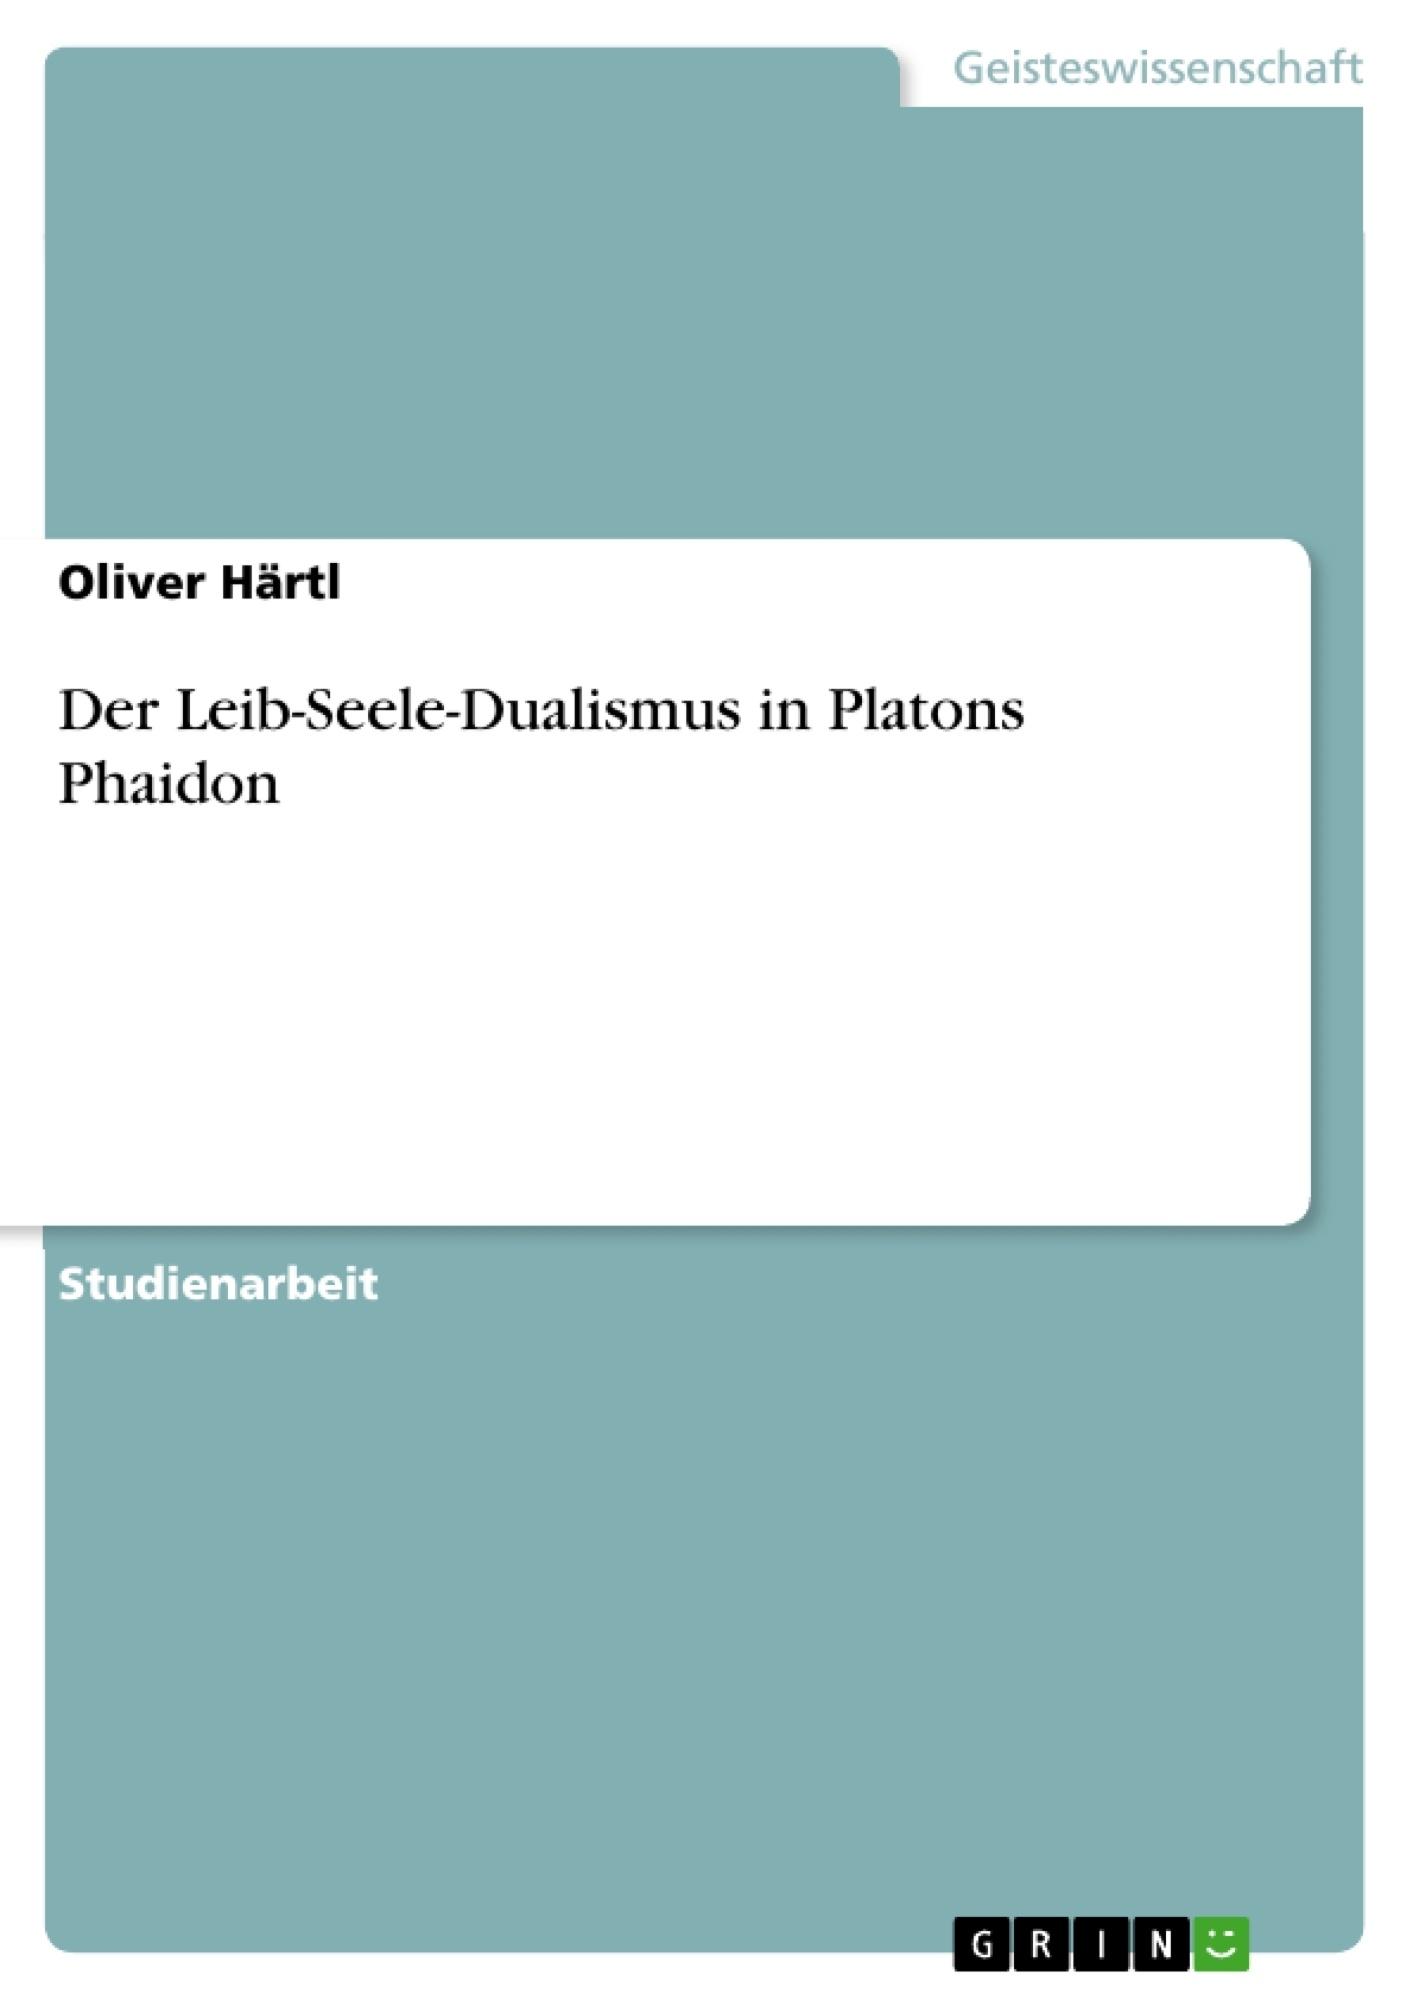 Titel: Der Leib-Seele-Dualismus in Platons Phaidon